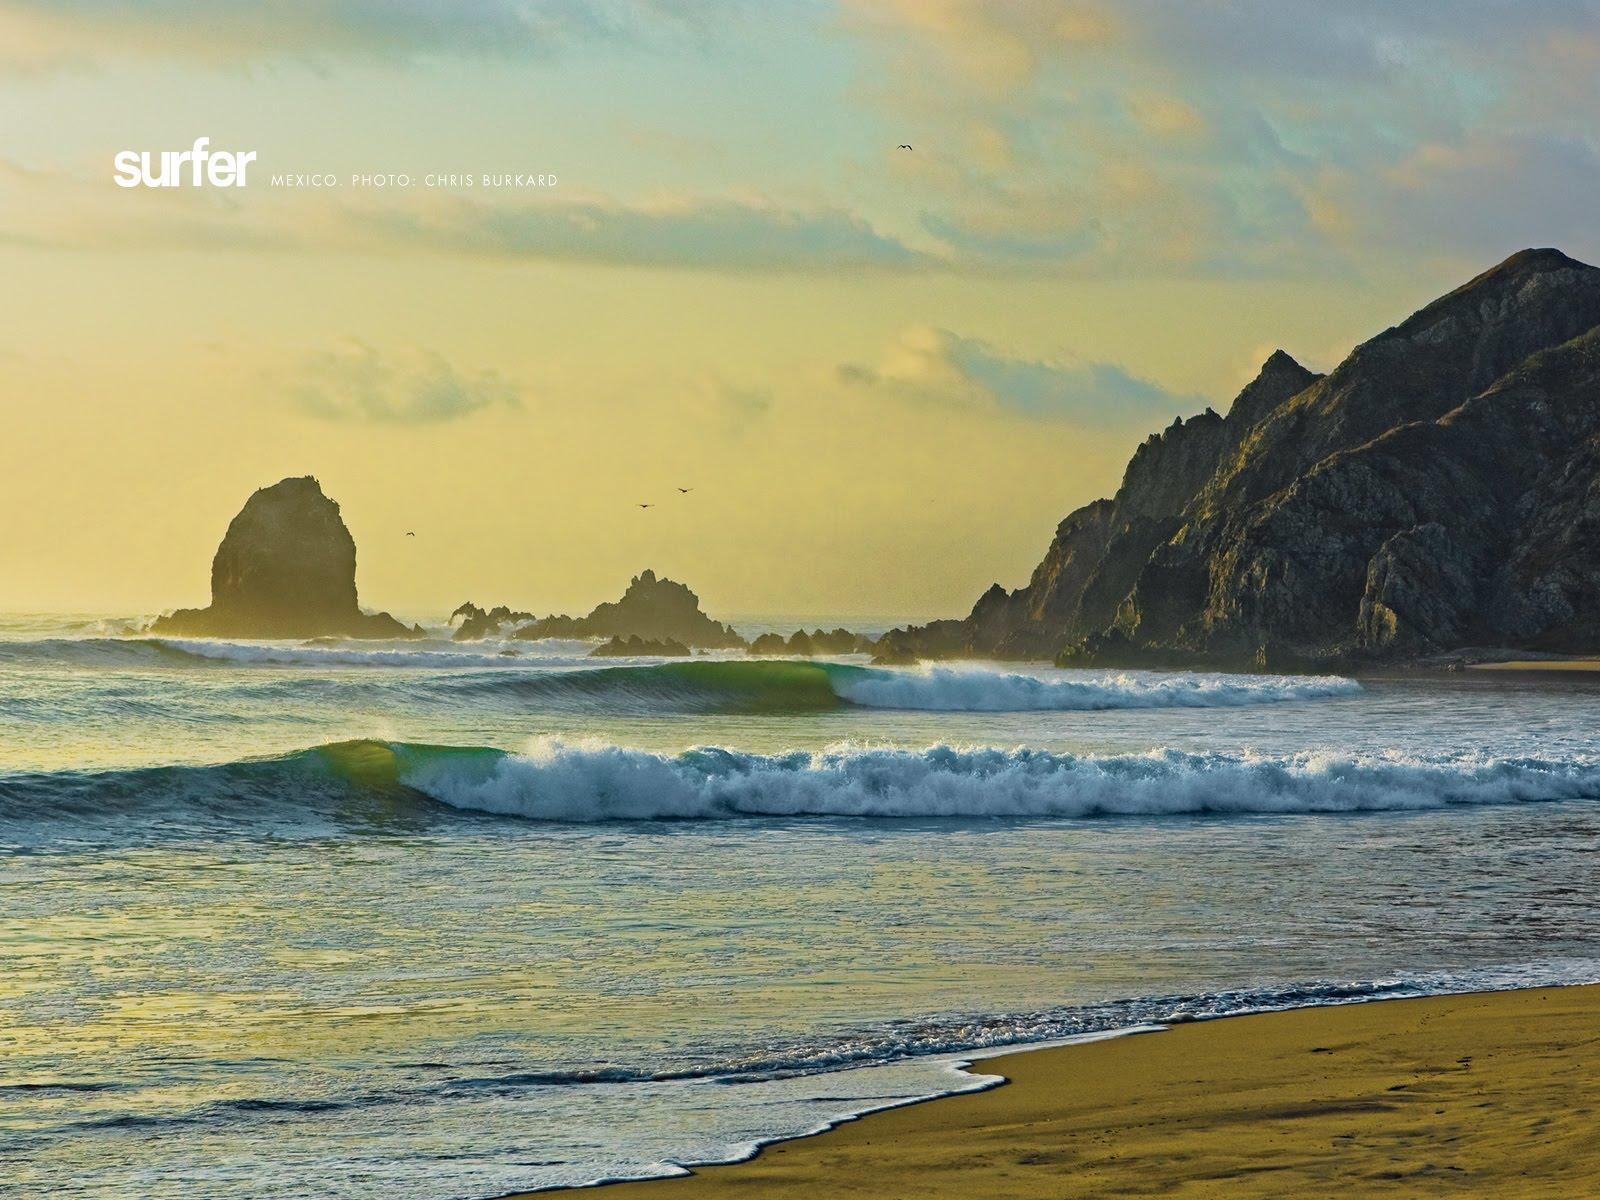 California Wallpaper Iphone 7 Chris Burkard Surfer Mag Wallpaper Downloads